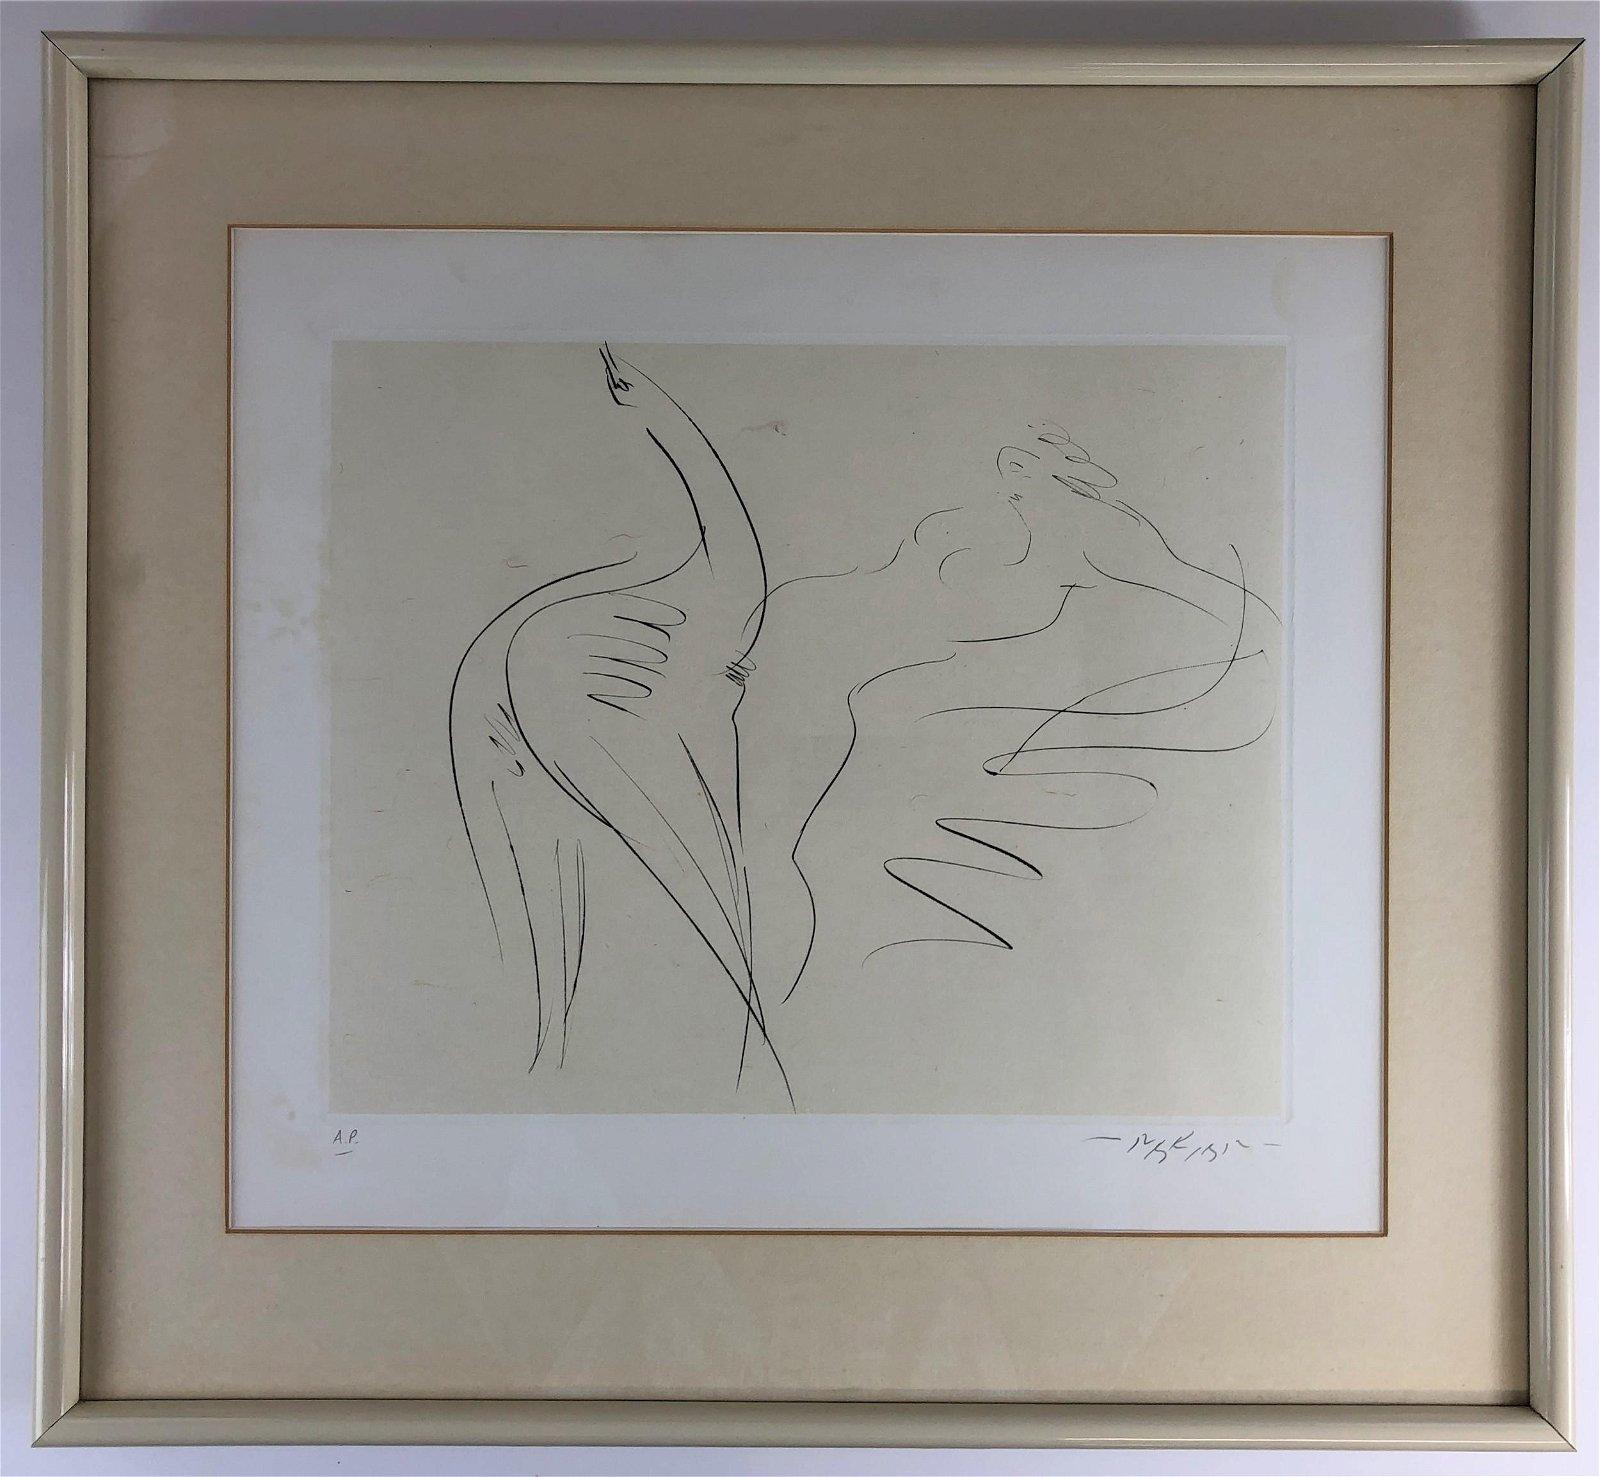 Artist Proof Intaglio Print on Paper